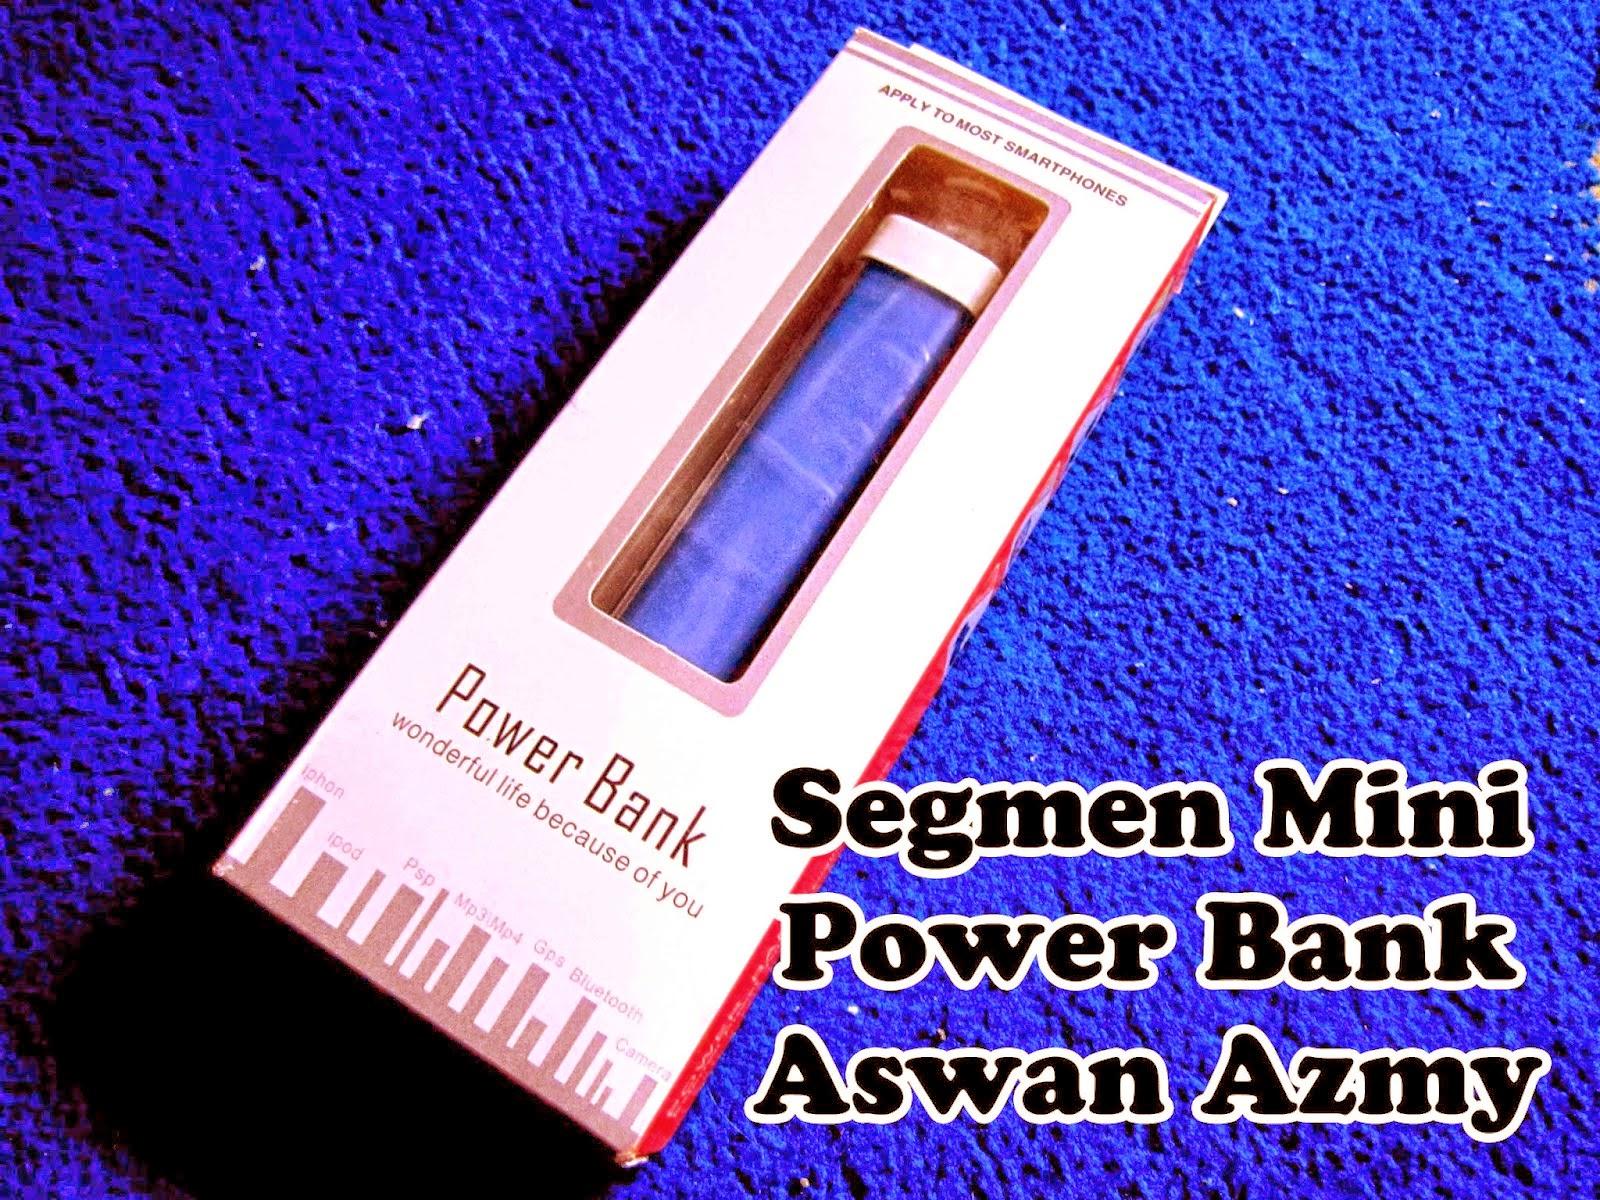 http://aswanazmy.blogspot.com/2014/04/segmen-mini-power-bank-aswan-azmy.html